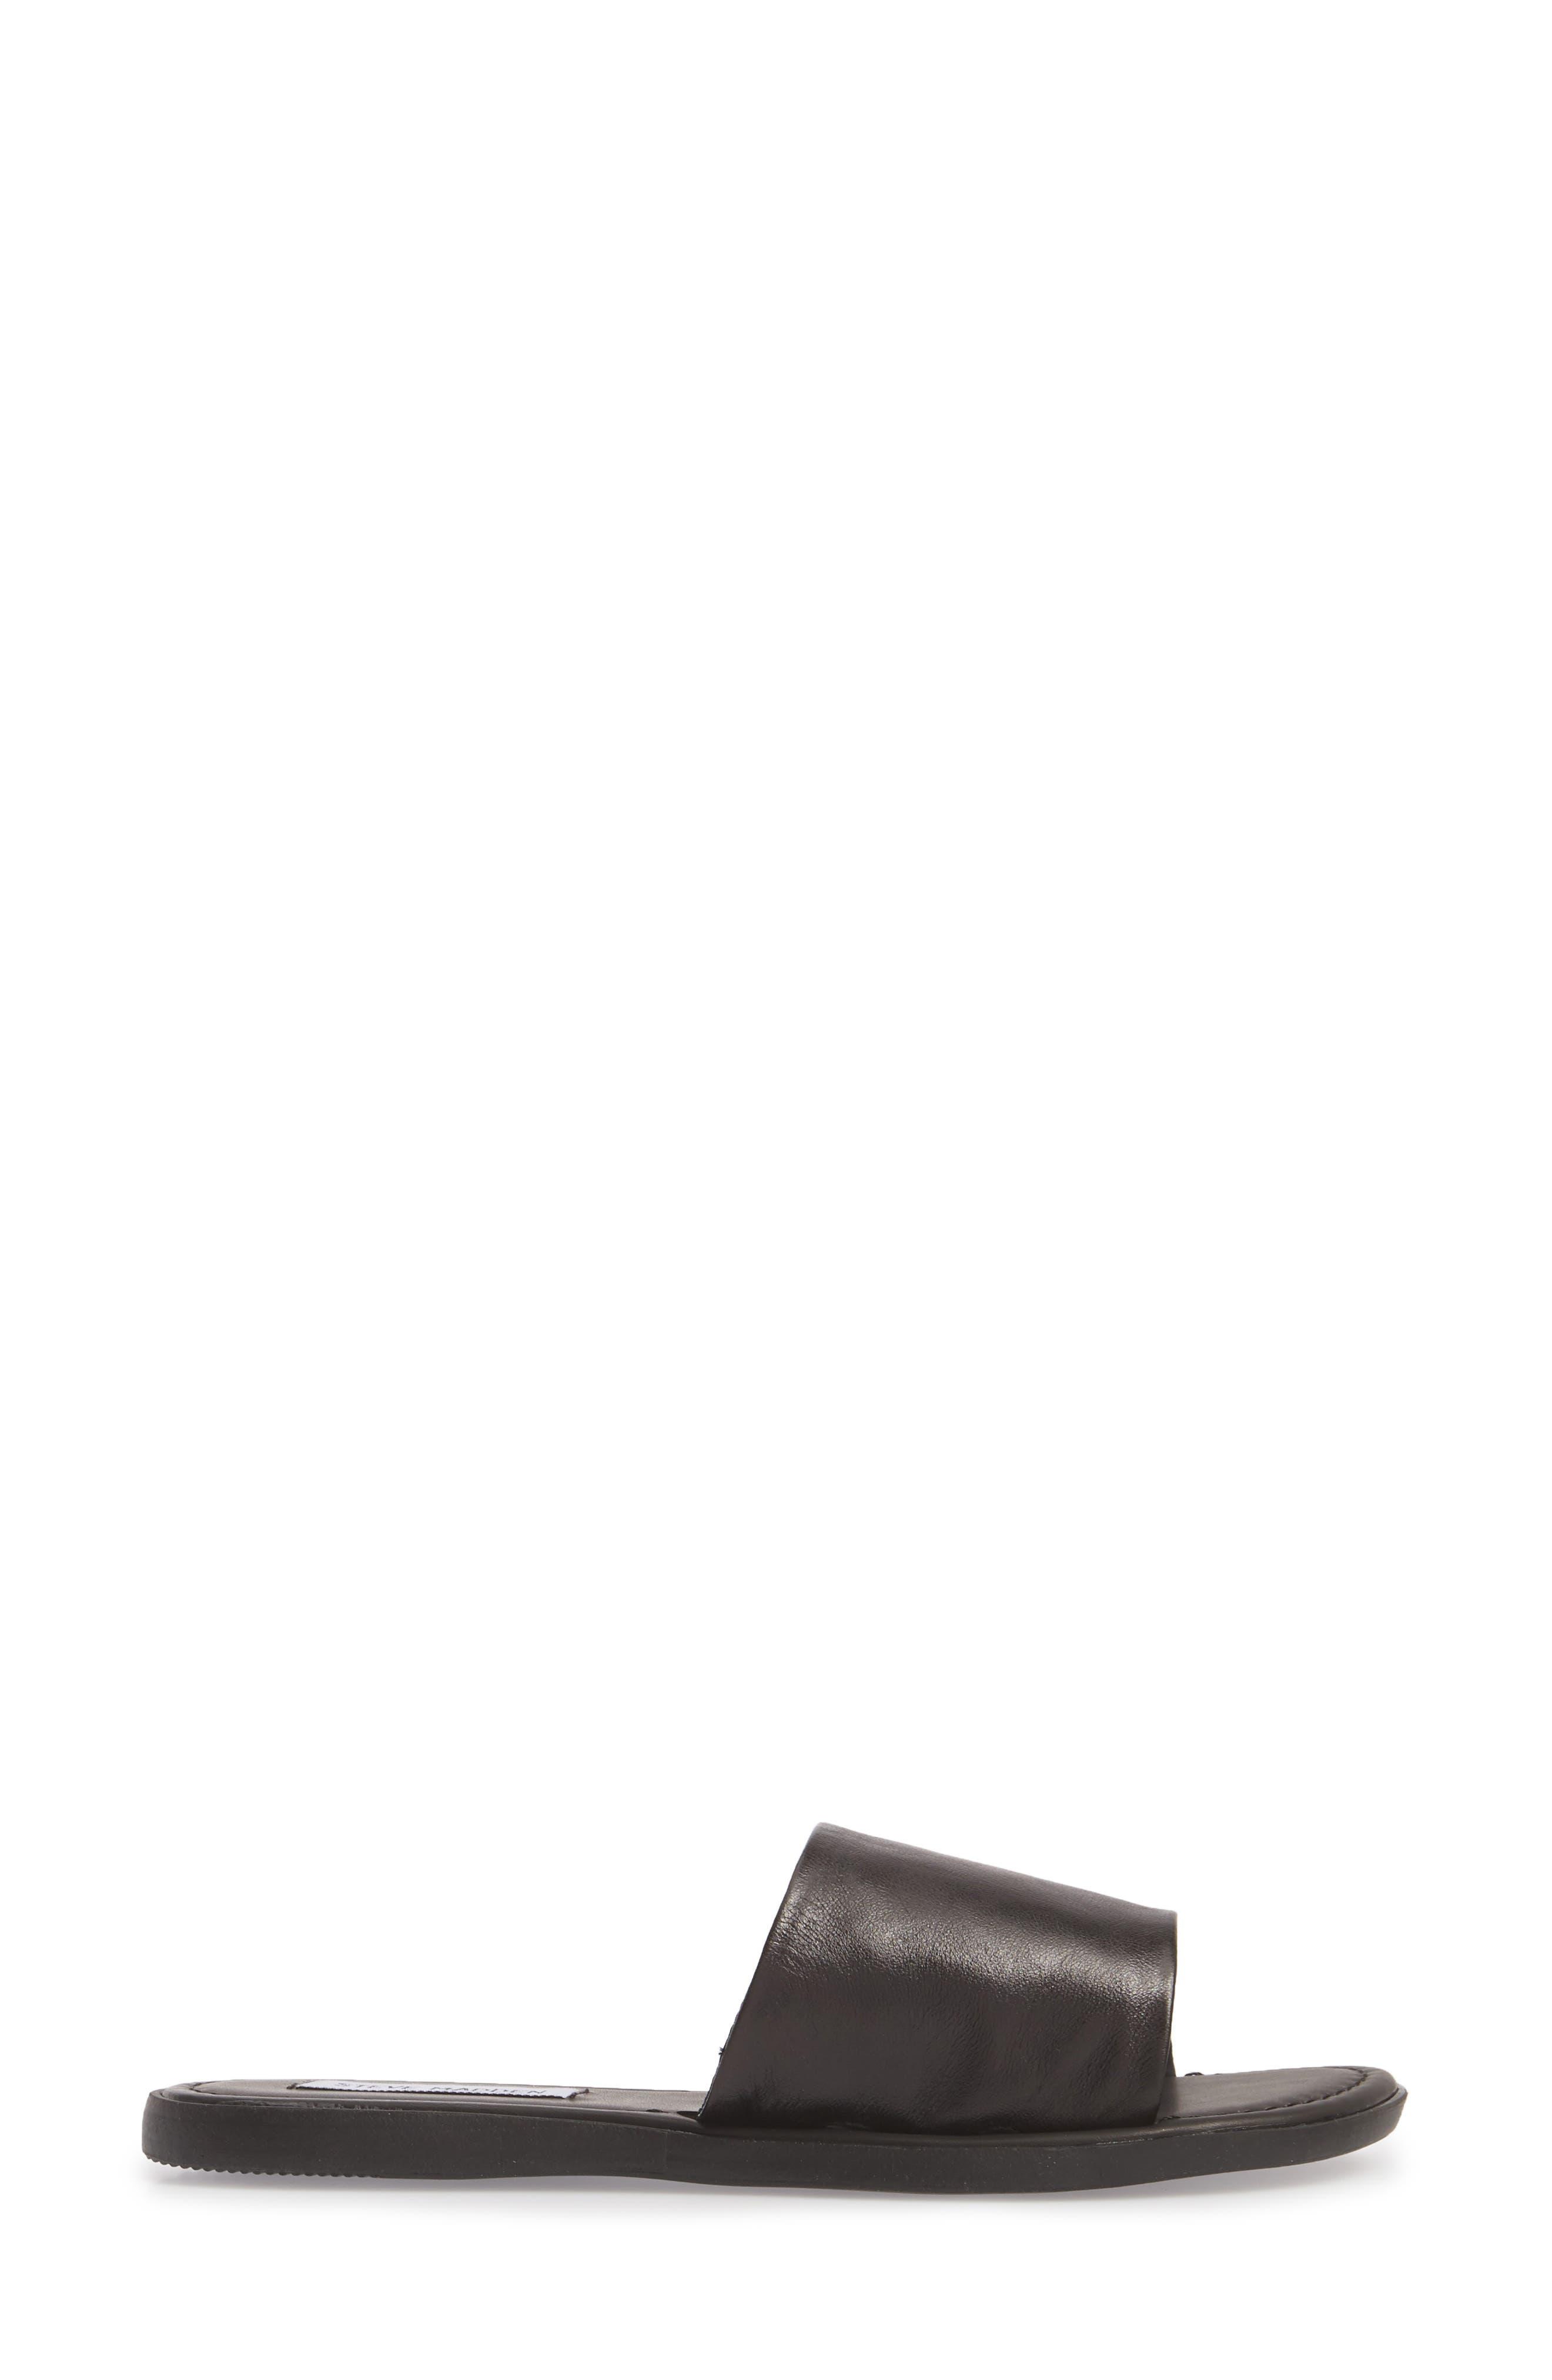 Camilla Slide Sandal,                             Alternate thumbnail 3, color,                             Black Leather